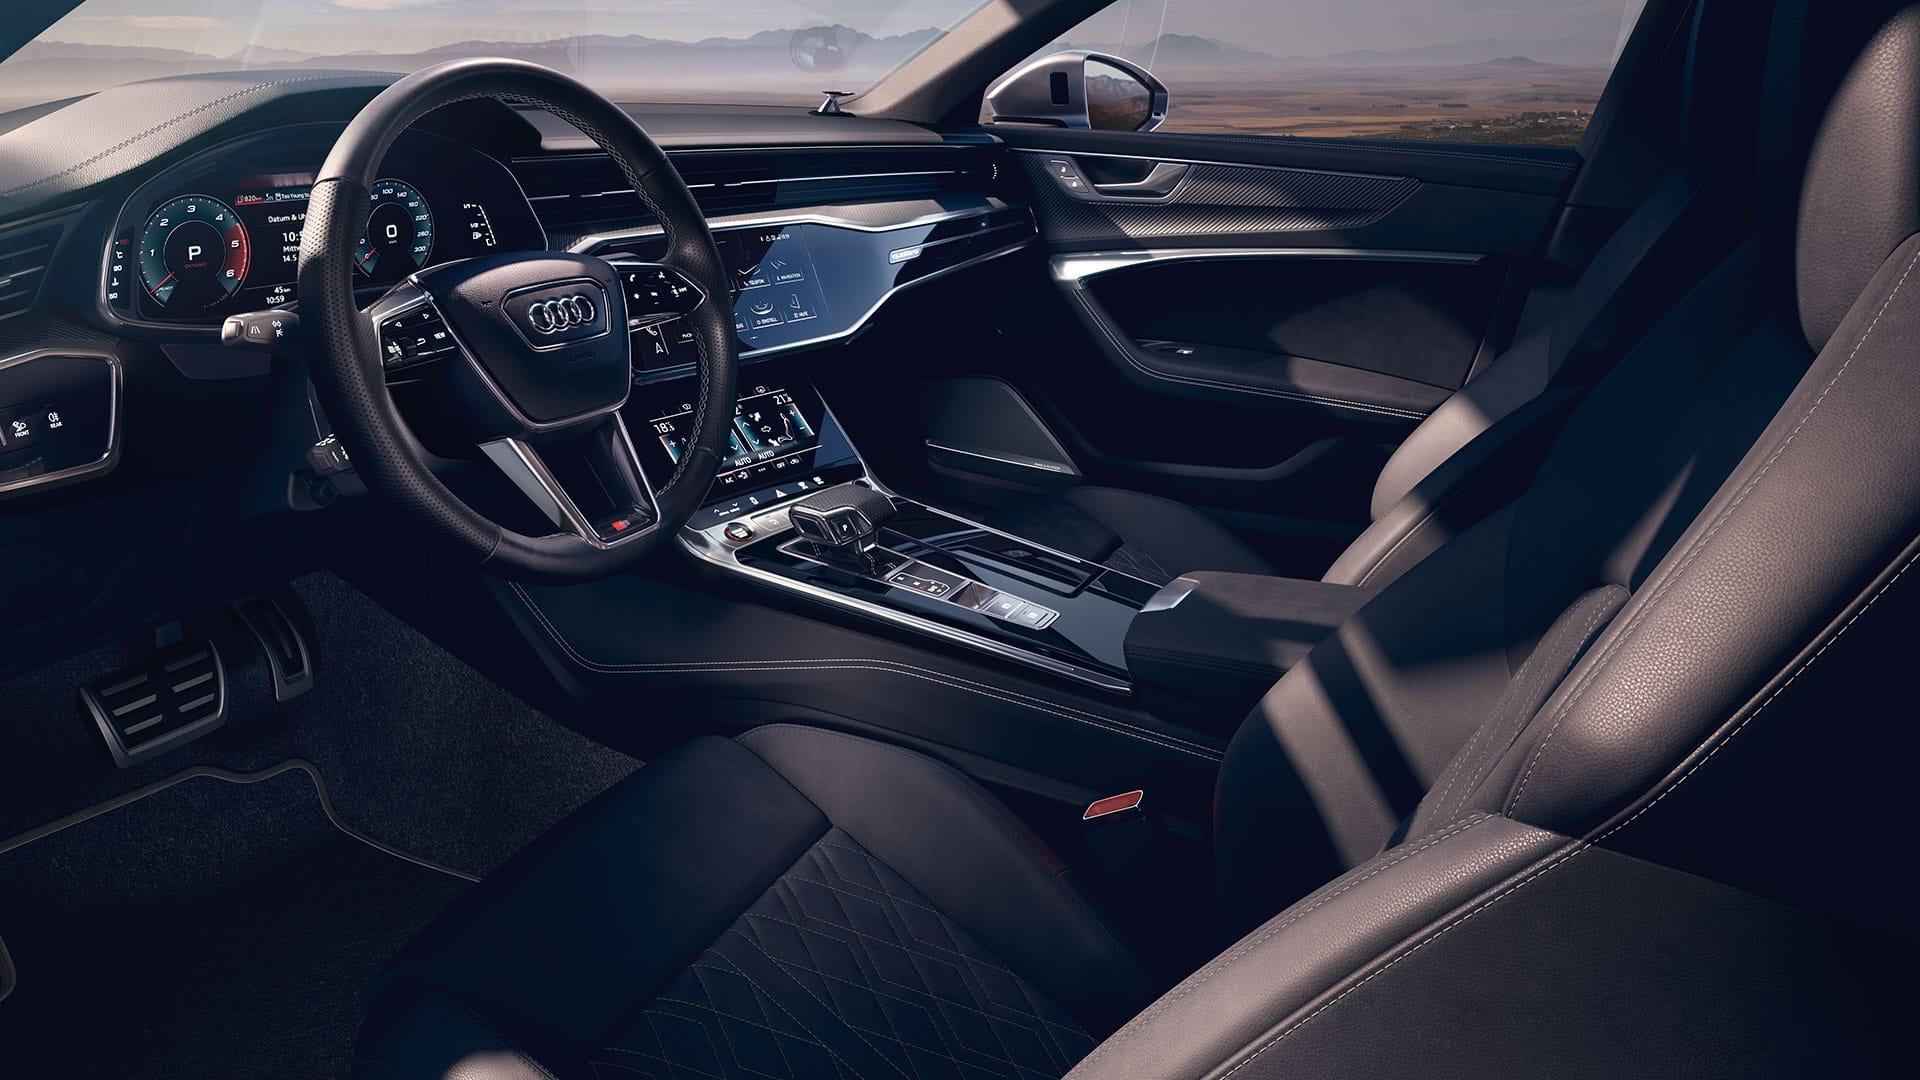 2020 Audi S6 First Drive